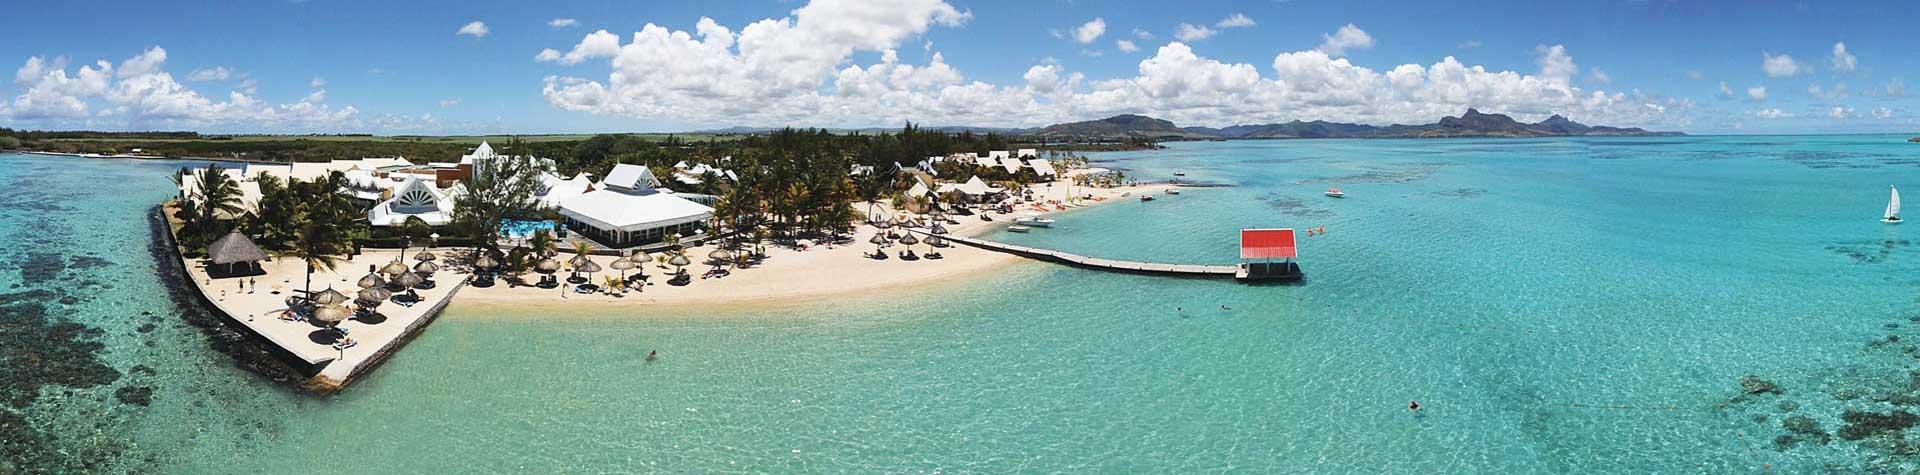 Preskil Beach Resort Aerial Photo